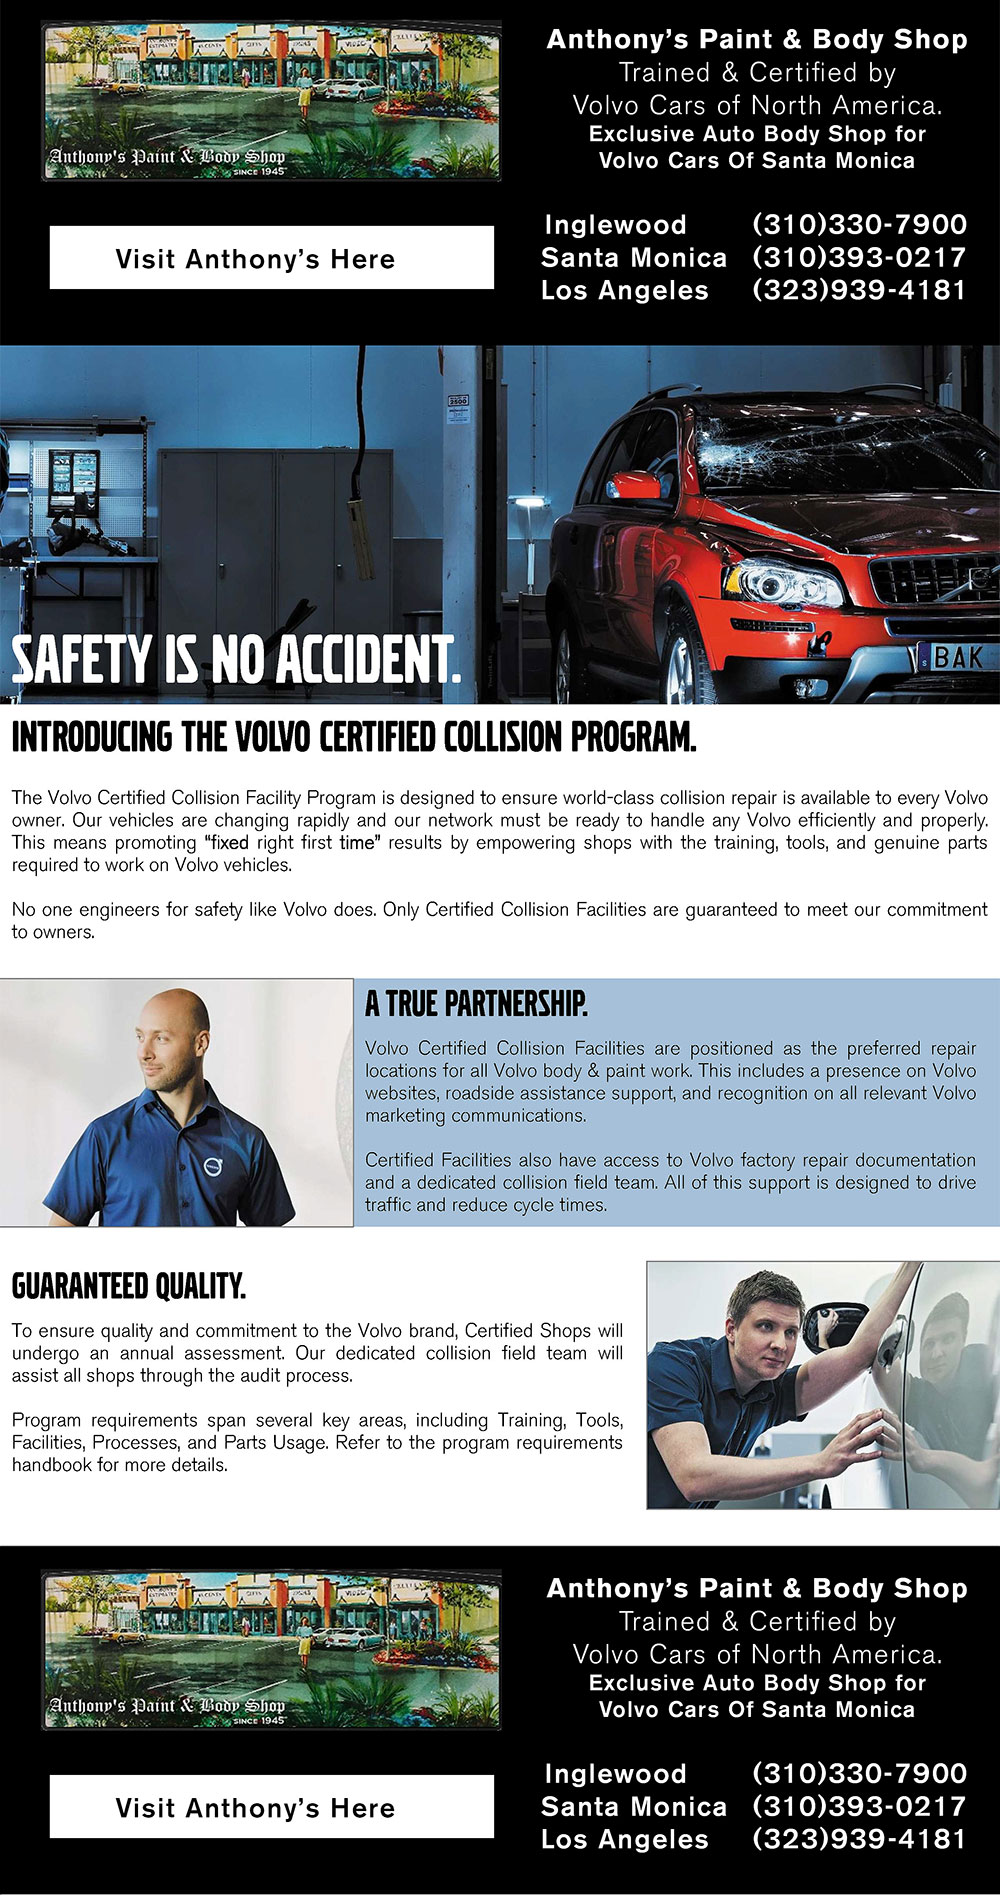 Volvo Certified Collision Facility(VCCF) Program | Volvo Cars Santa Monica